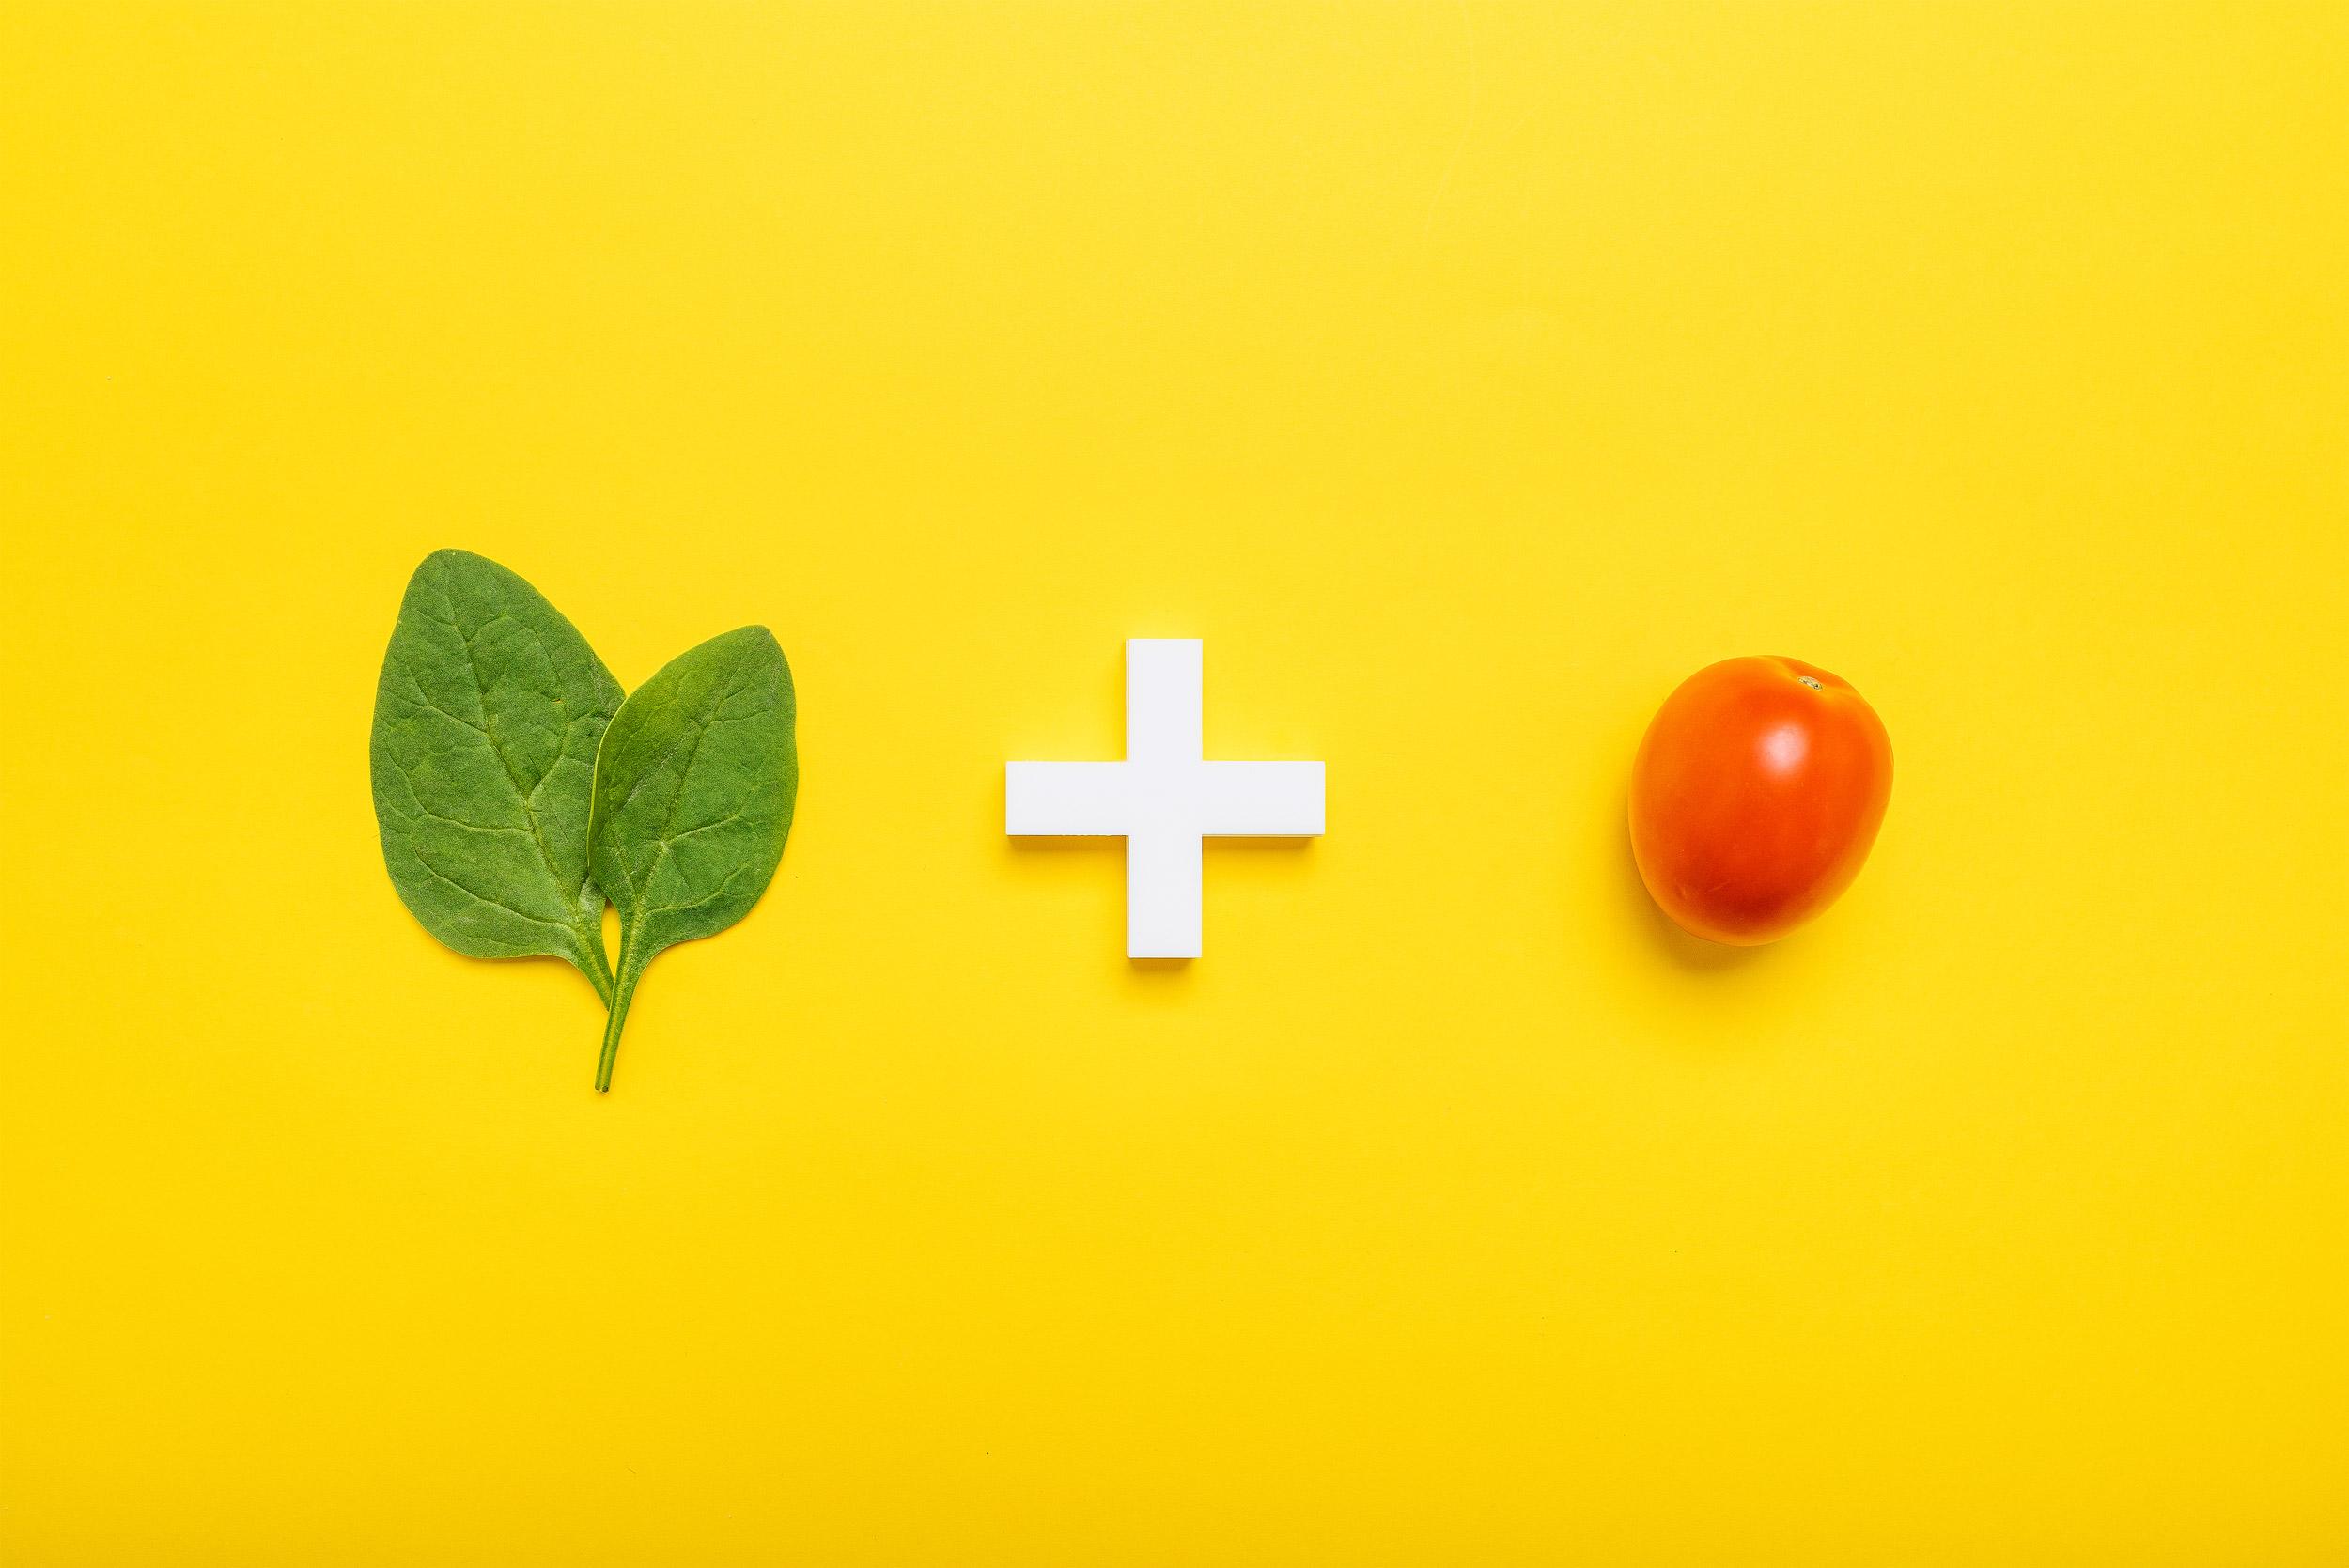 07espinaca-tomate.jpg